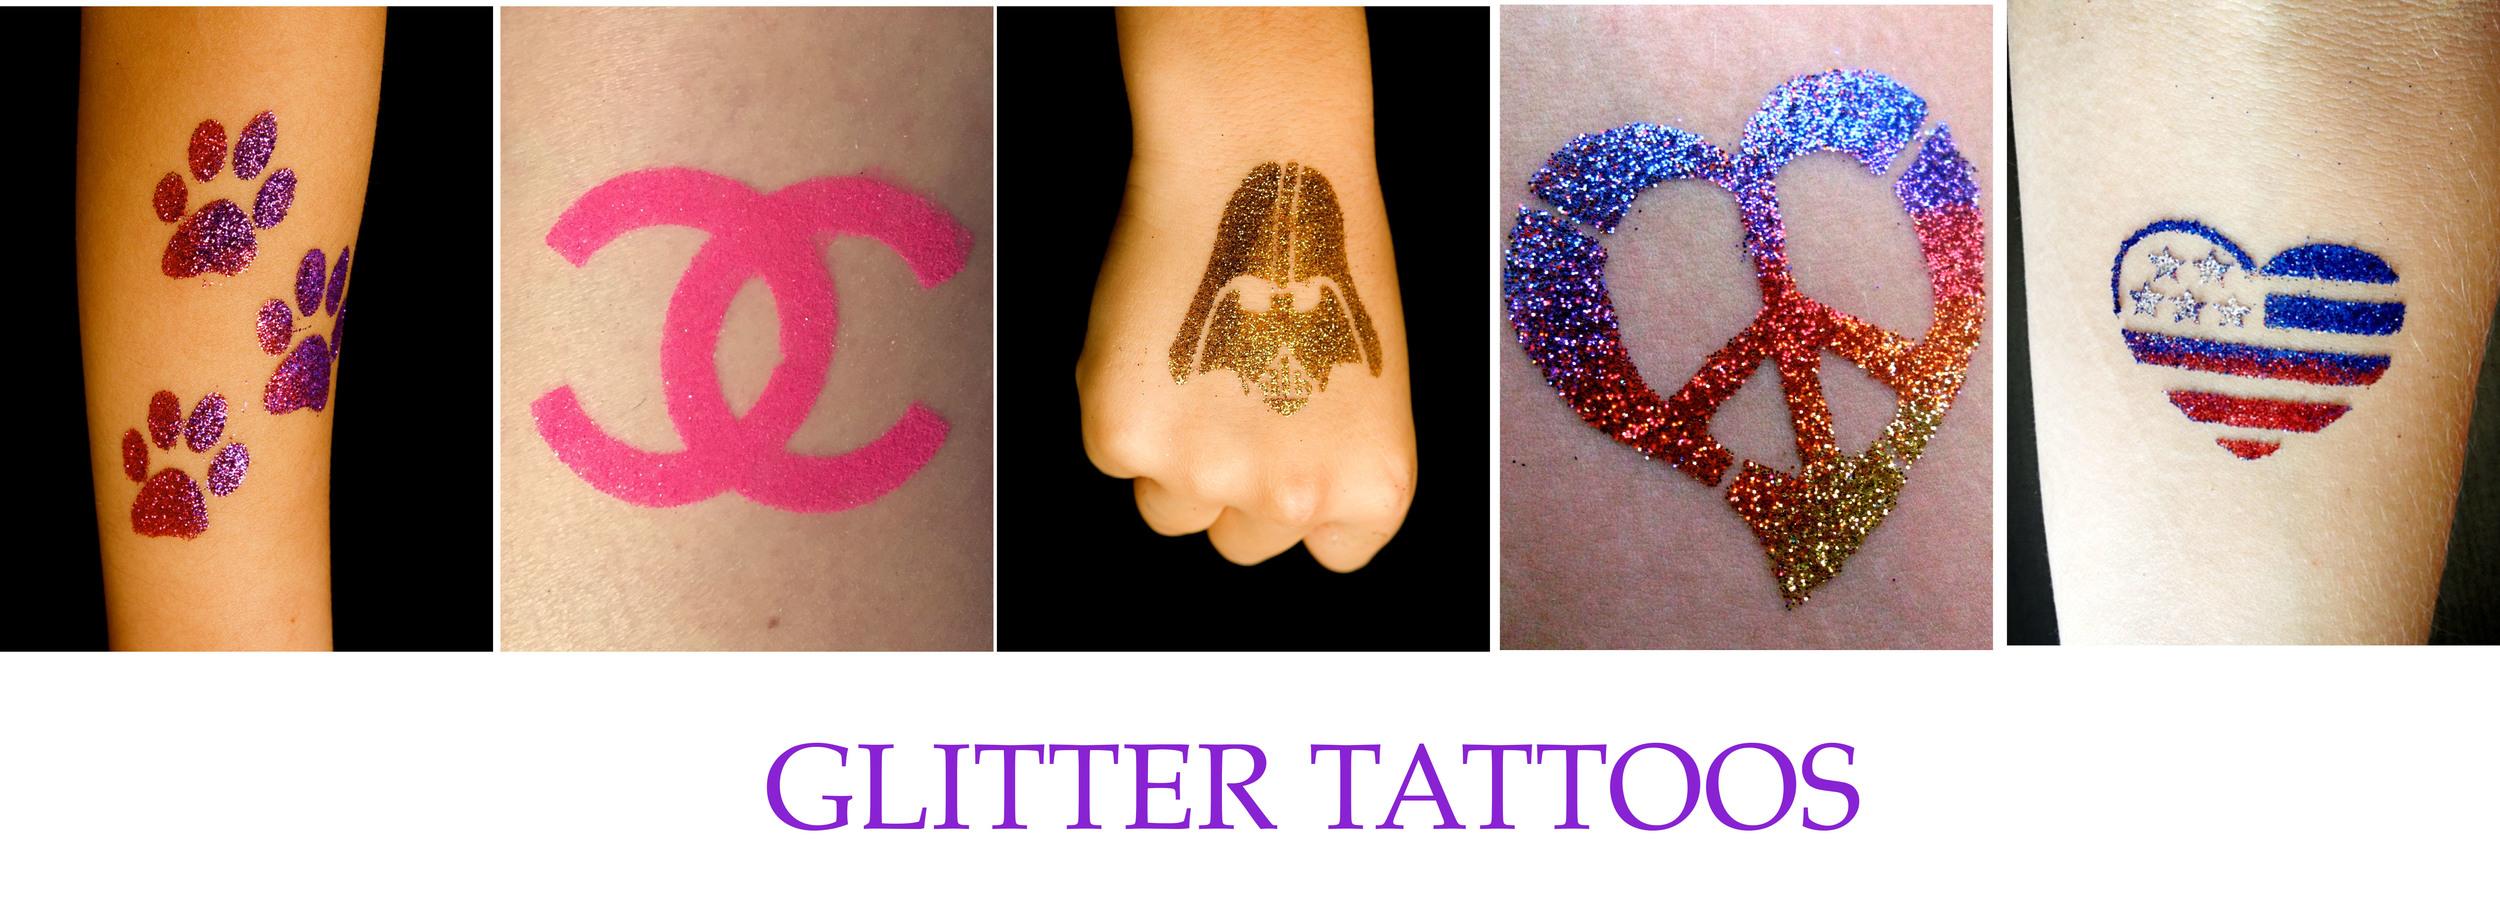 Glitter Tattoos We Adorn You.jpg